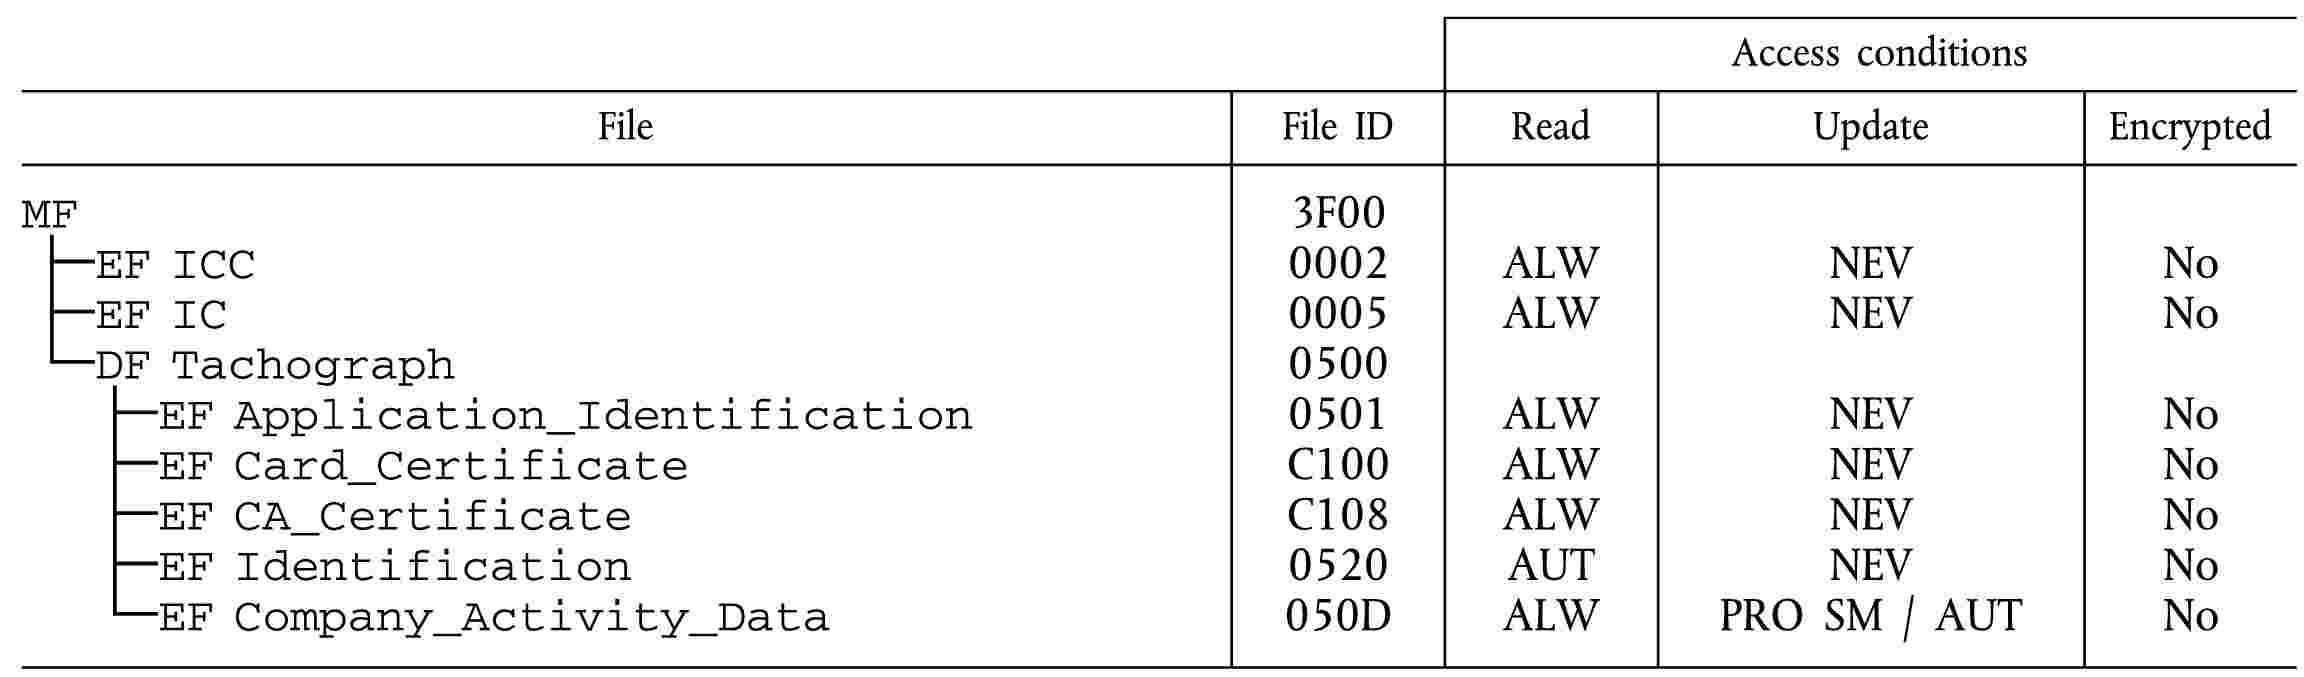 JFIF P15 'A ]15r~C kCGT\ M\15 FT[z Nz$iTS a GU /c15 k rGUp B 'v ...